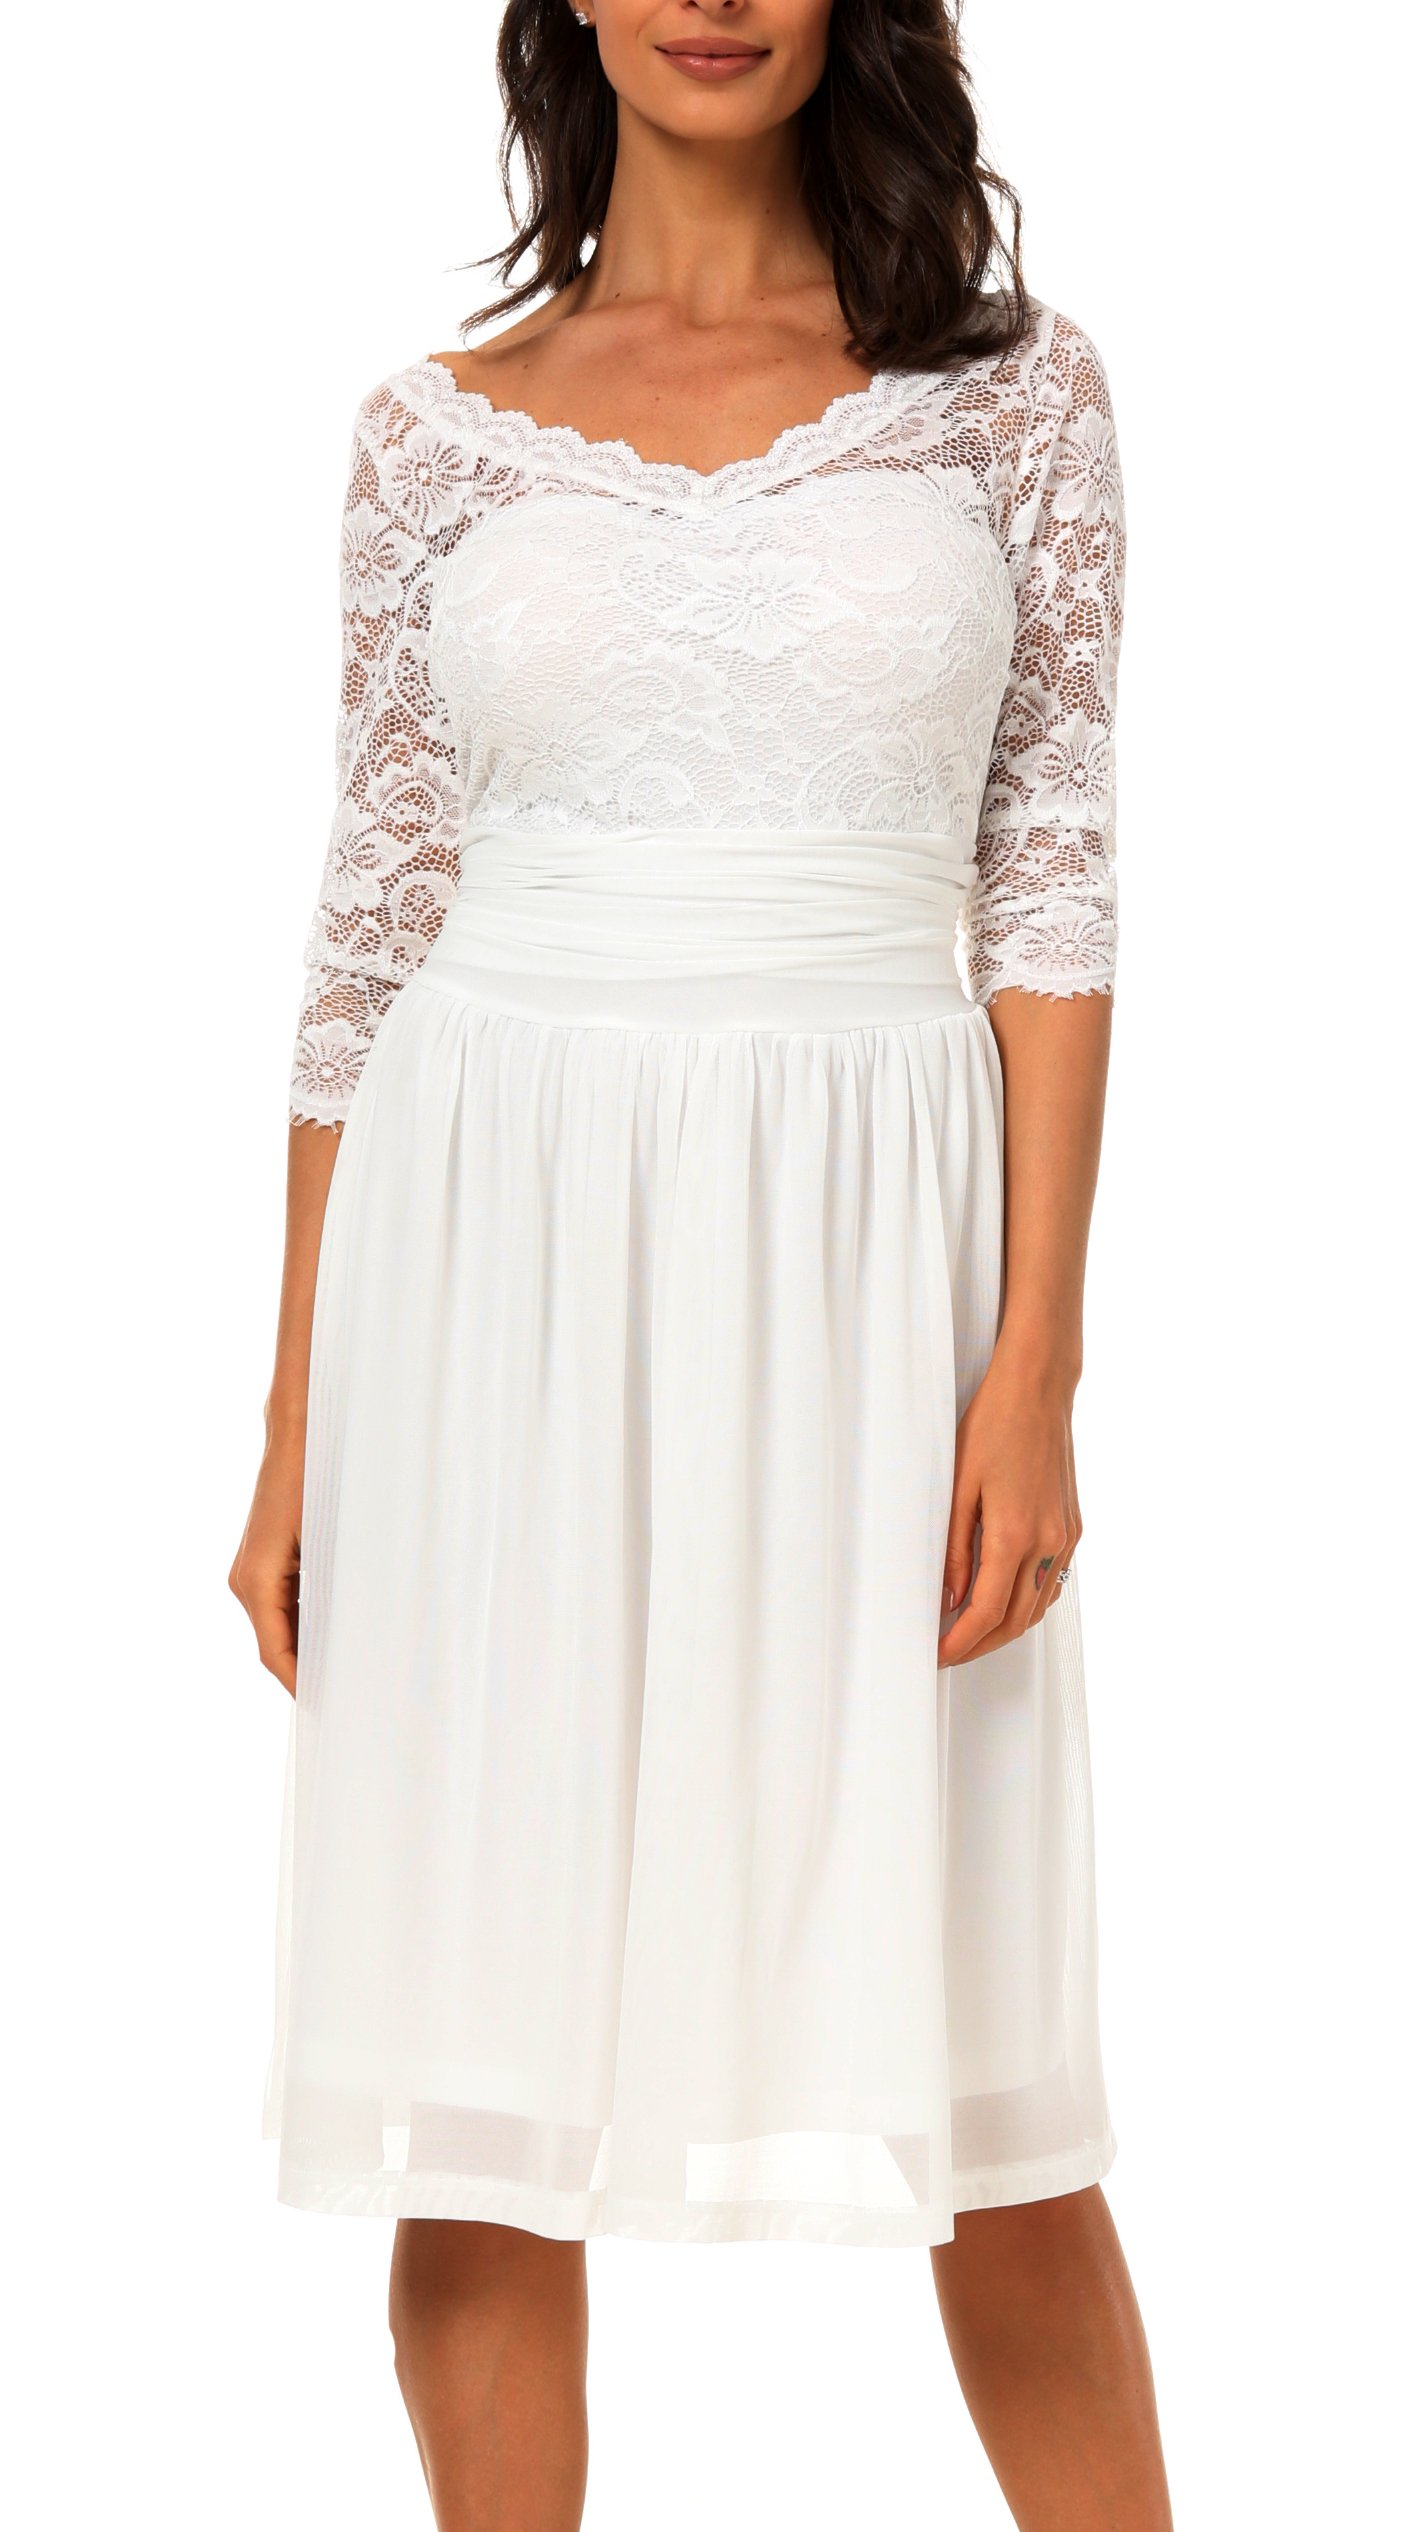 DILANNI Women's Long Sleeve Ruched Waist Surplice V-Neck Semi Formal Dress